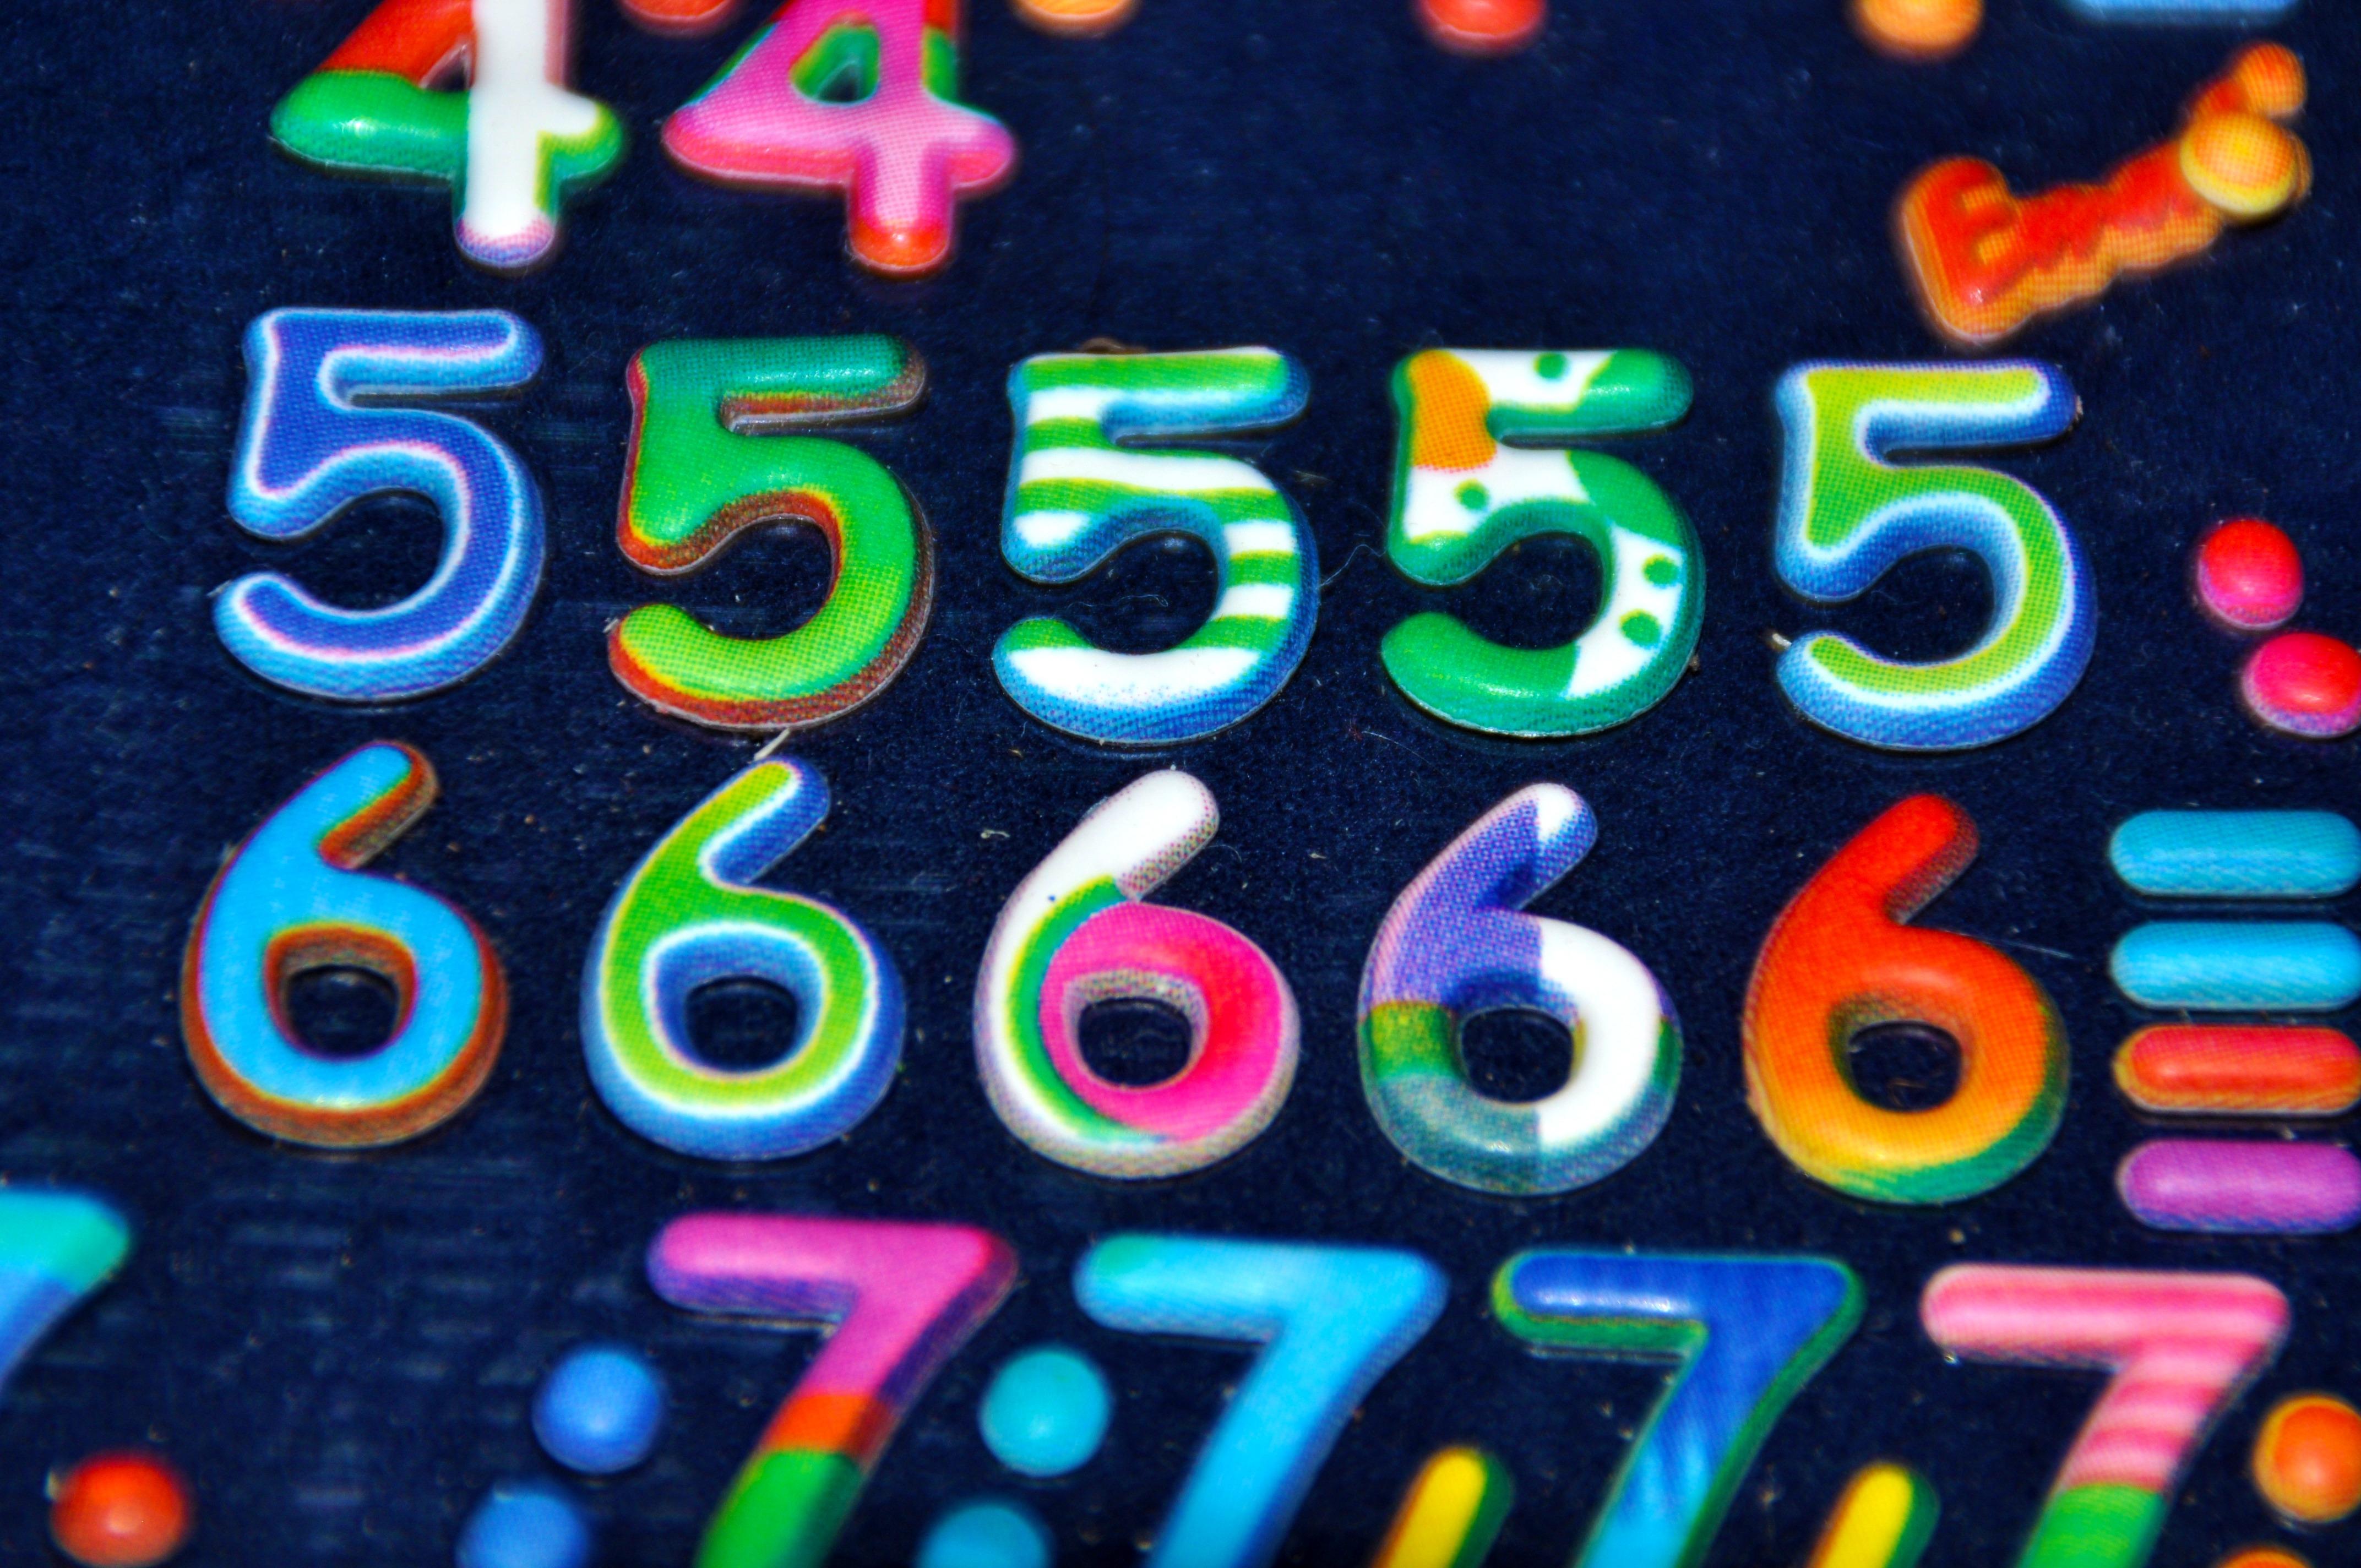 Fotos Gratis : Número, Comida, Color, Azul, Postre